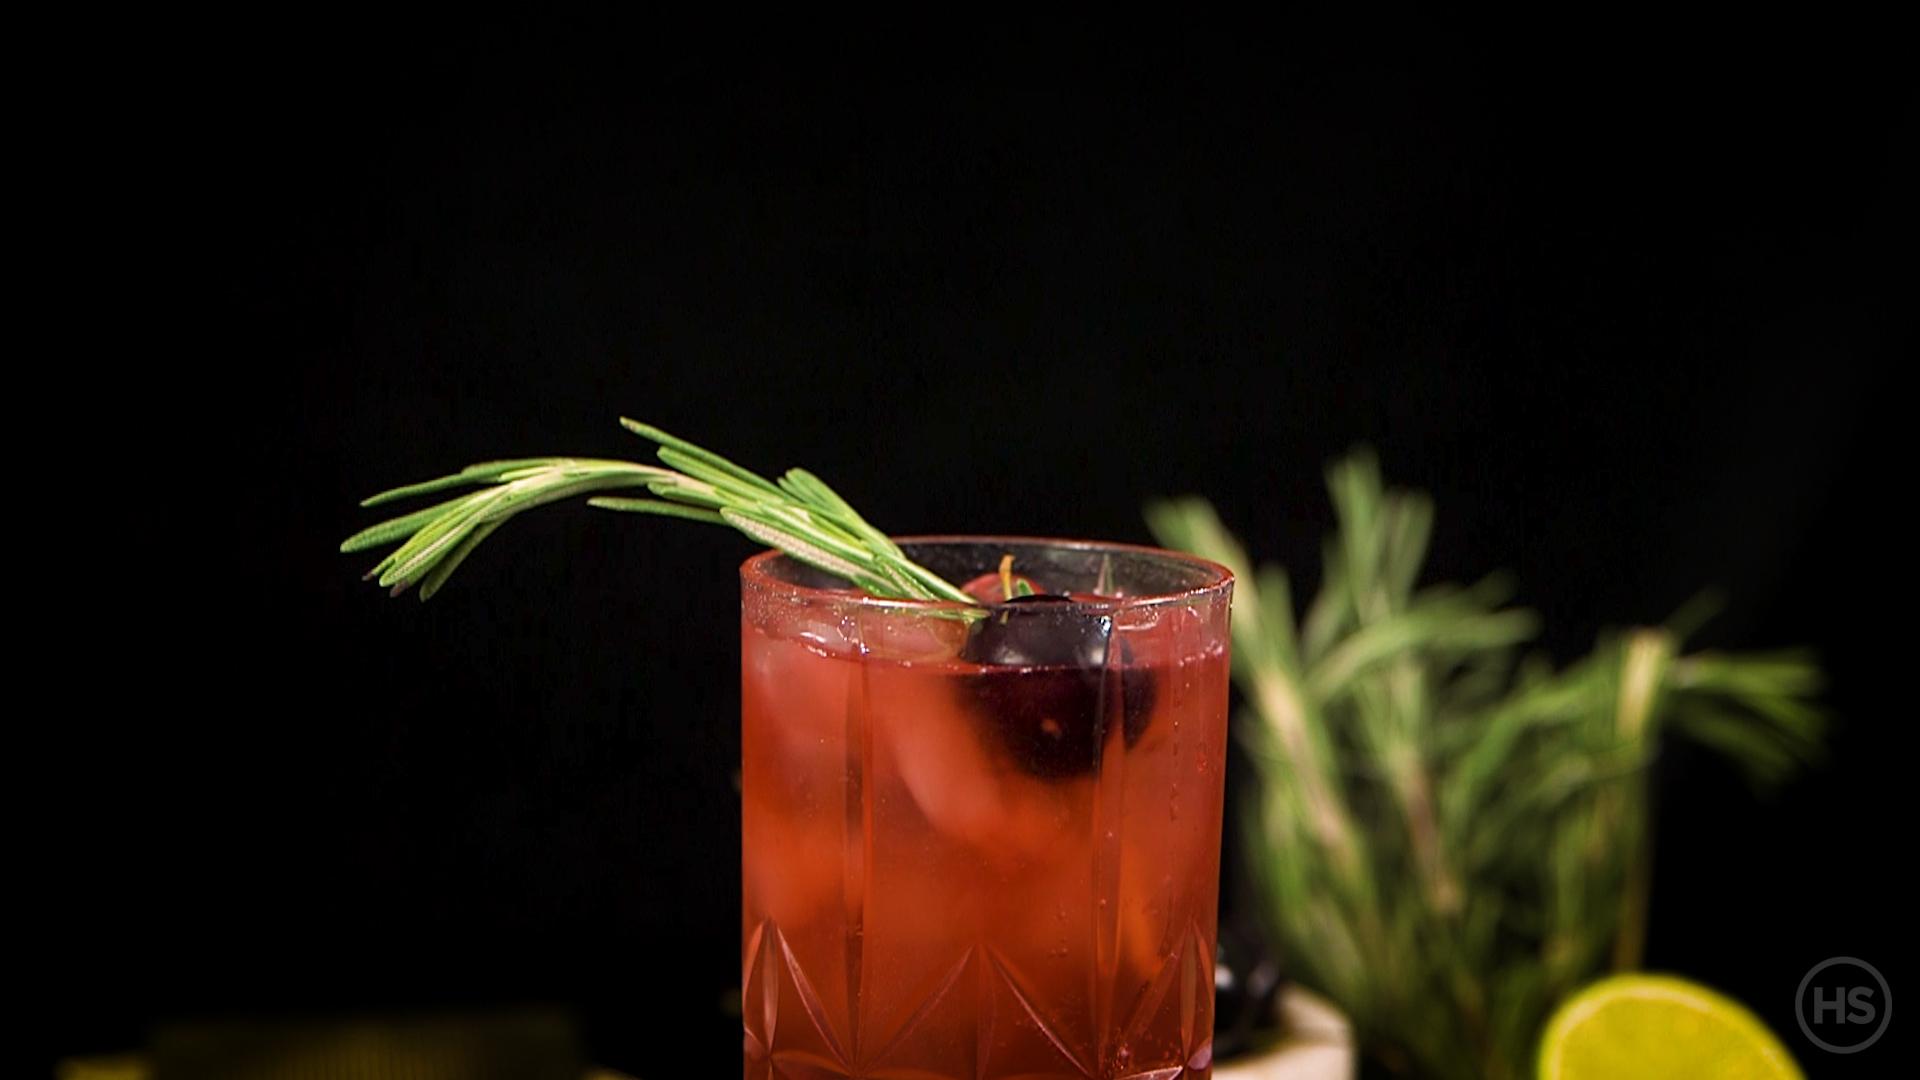 How to serve a vodka martini